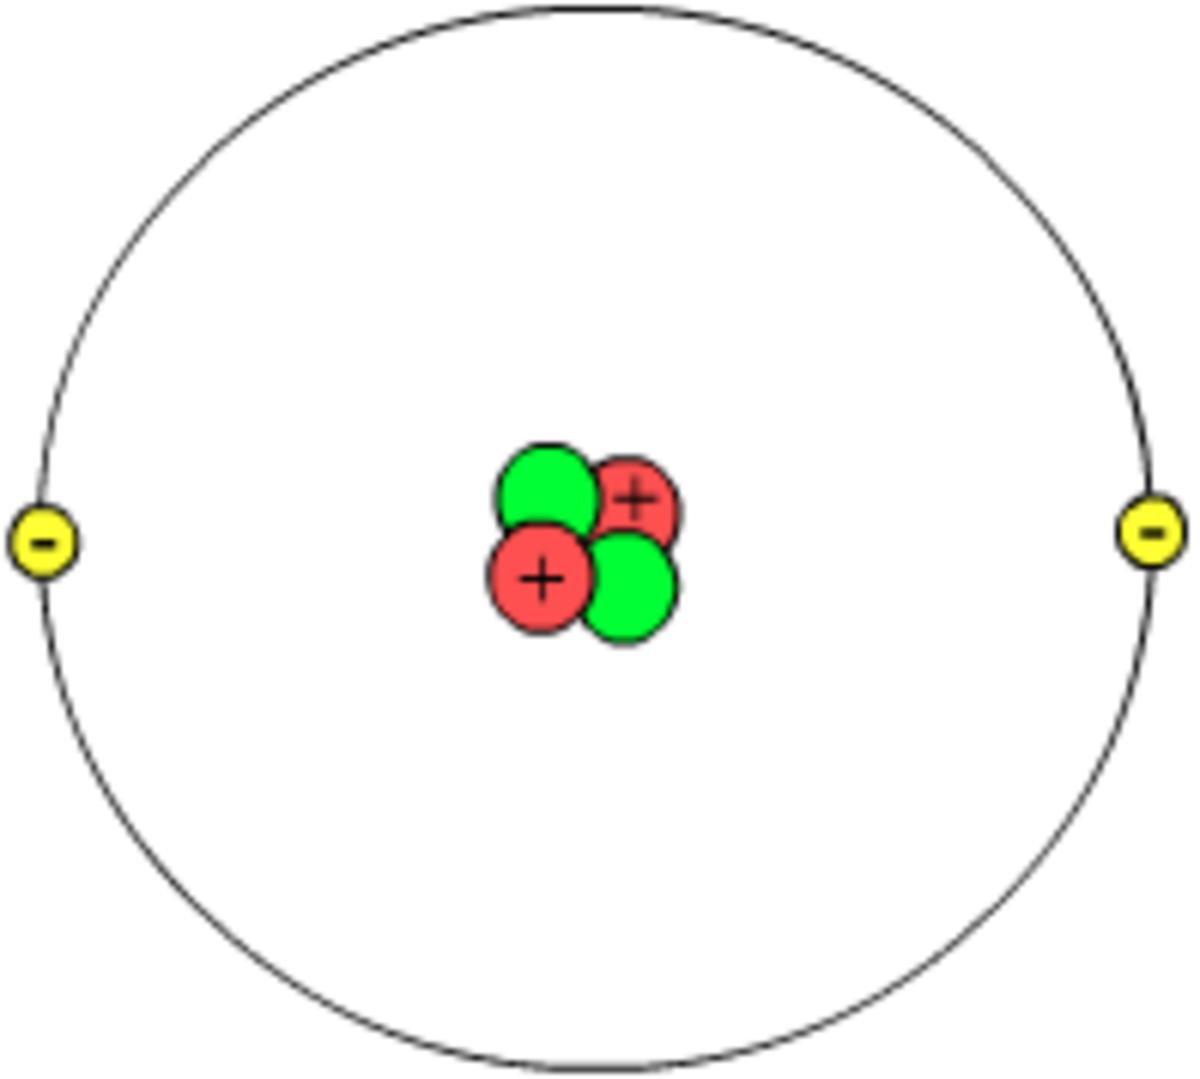 Modelisation of an atom of helium